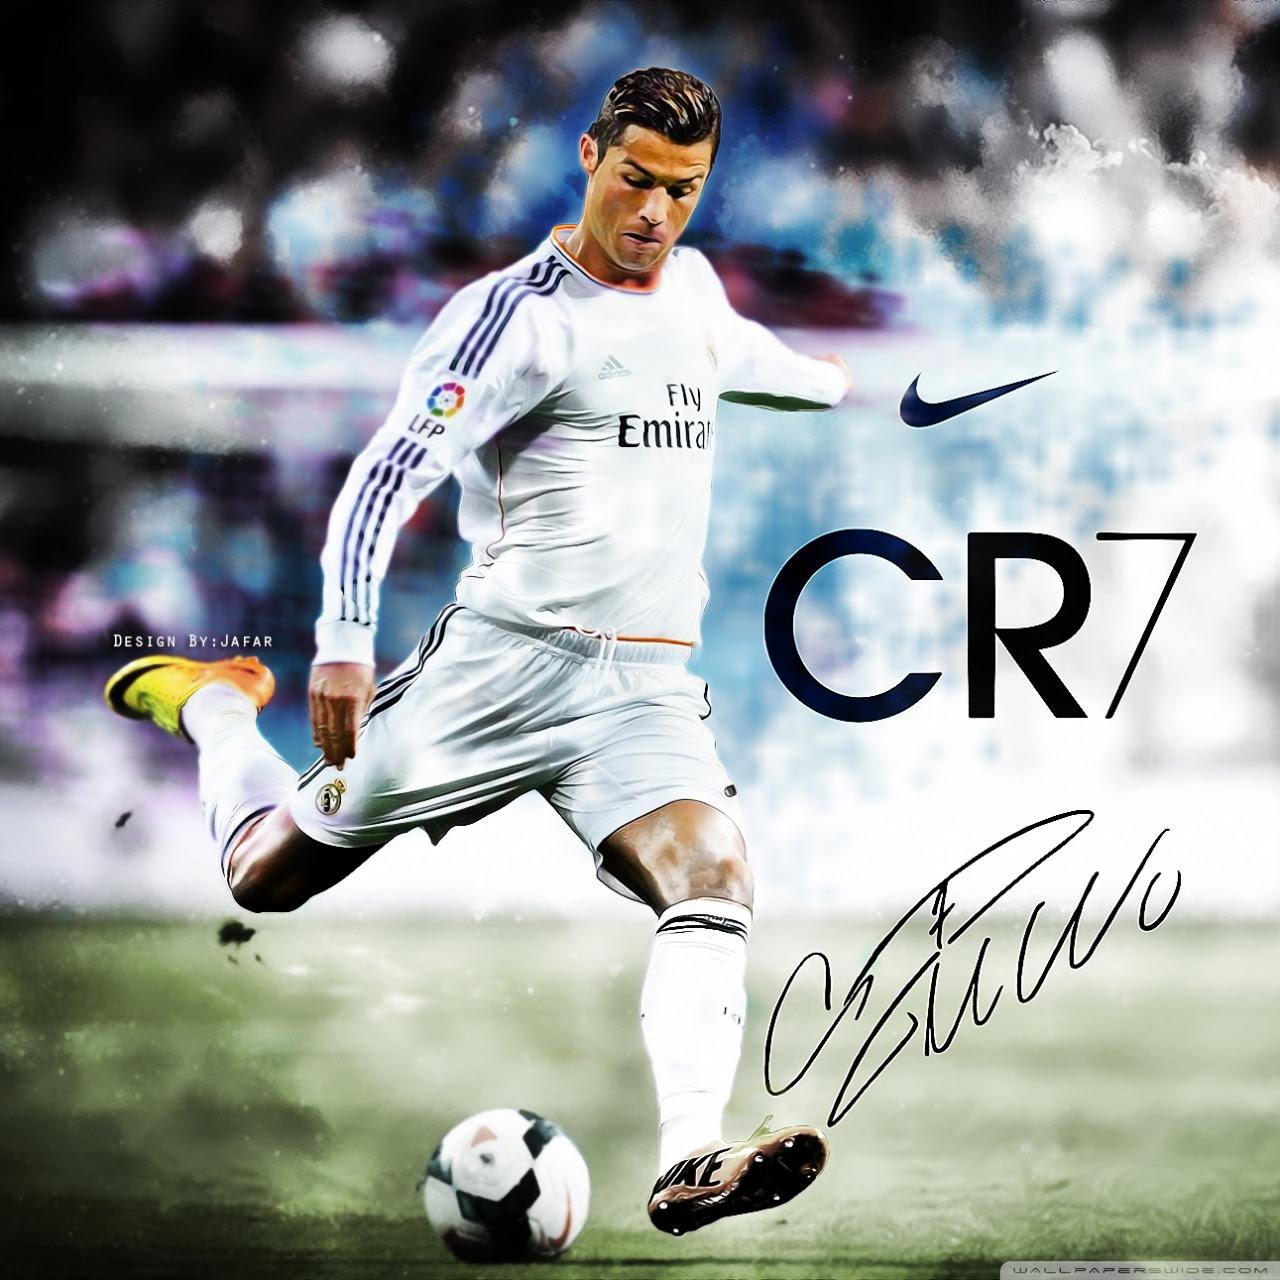 Cristiano Ronaldo Wallpaper Cr7 Wallpapers History